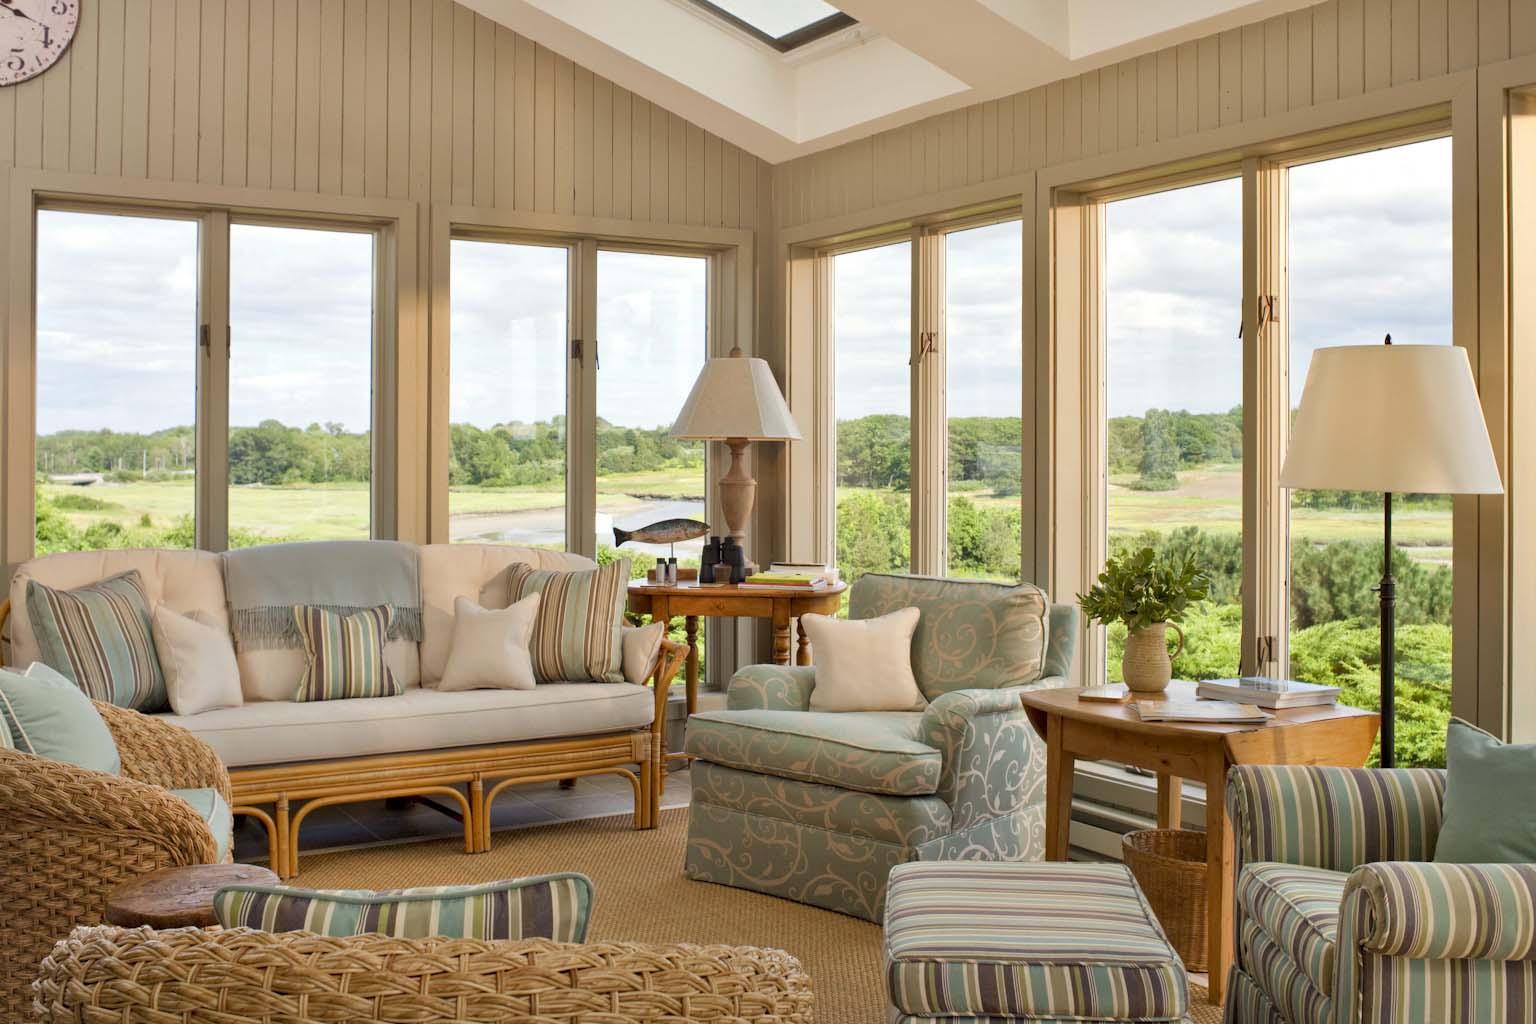 Elegant Sunroom furniture layout ideas to inspire you how to decor the sunroom sunroom furniture layout ideas